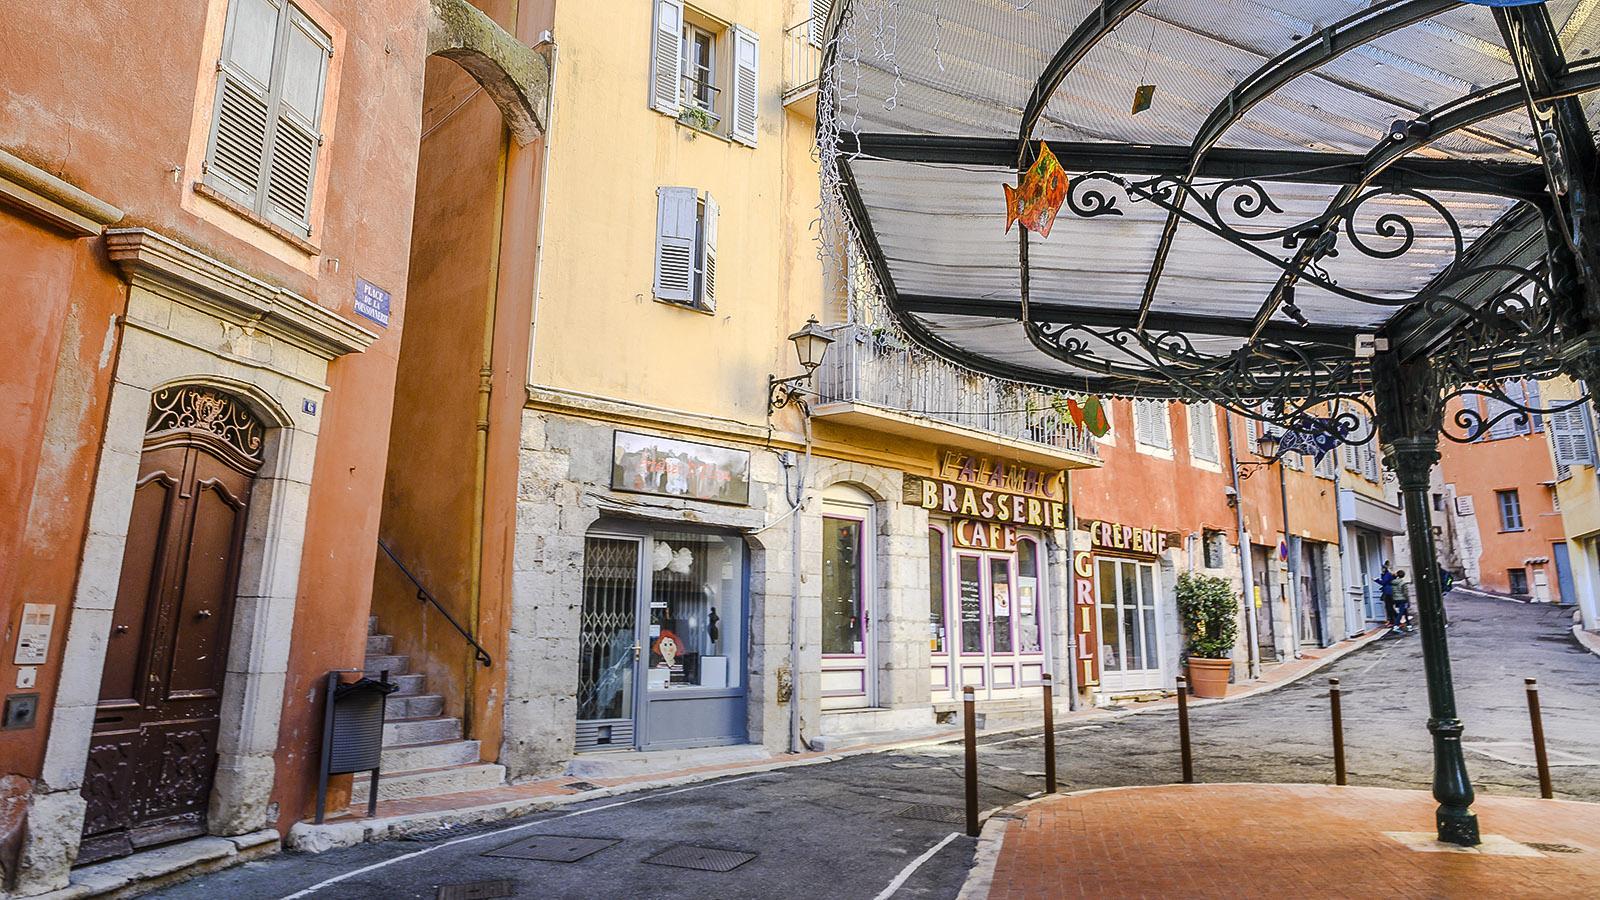 Grasse: Malerisch - die Place de la Poissonnerie. Foto: Hilke Maunder